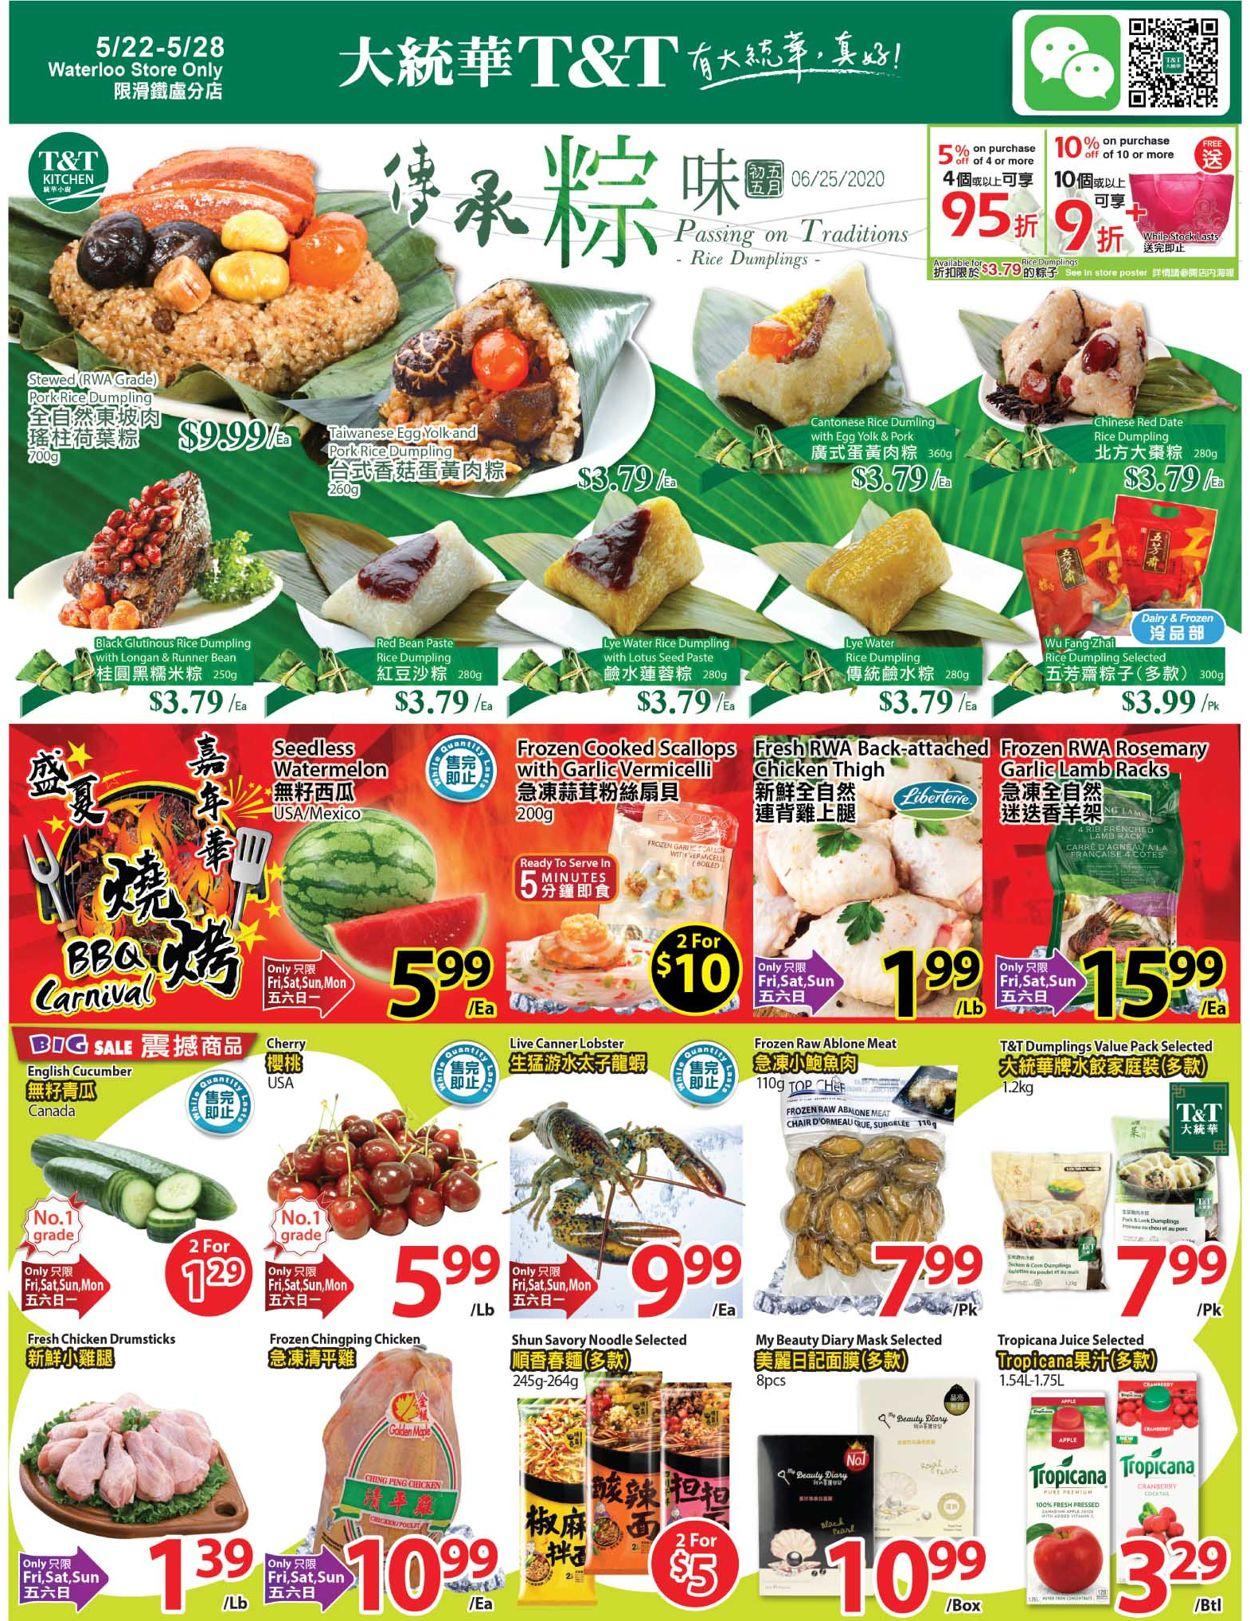 T&T Supermarket Flyer - 05/22-05/28/2020